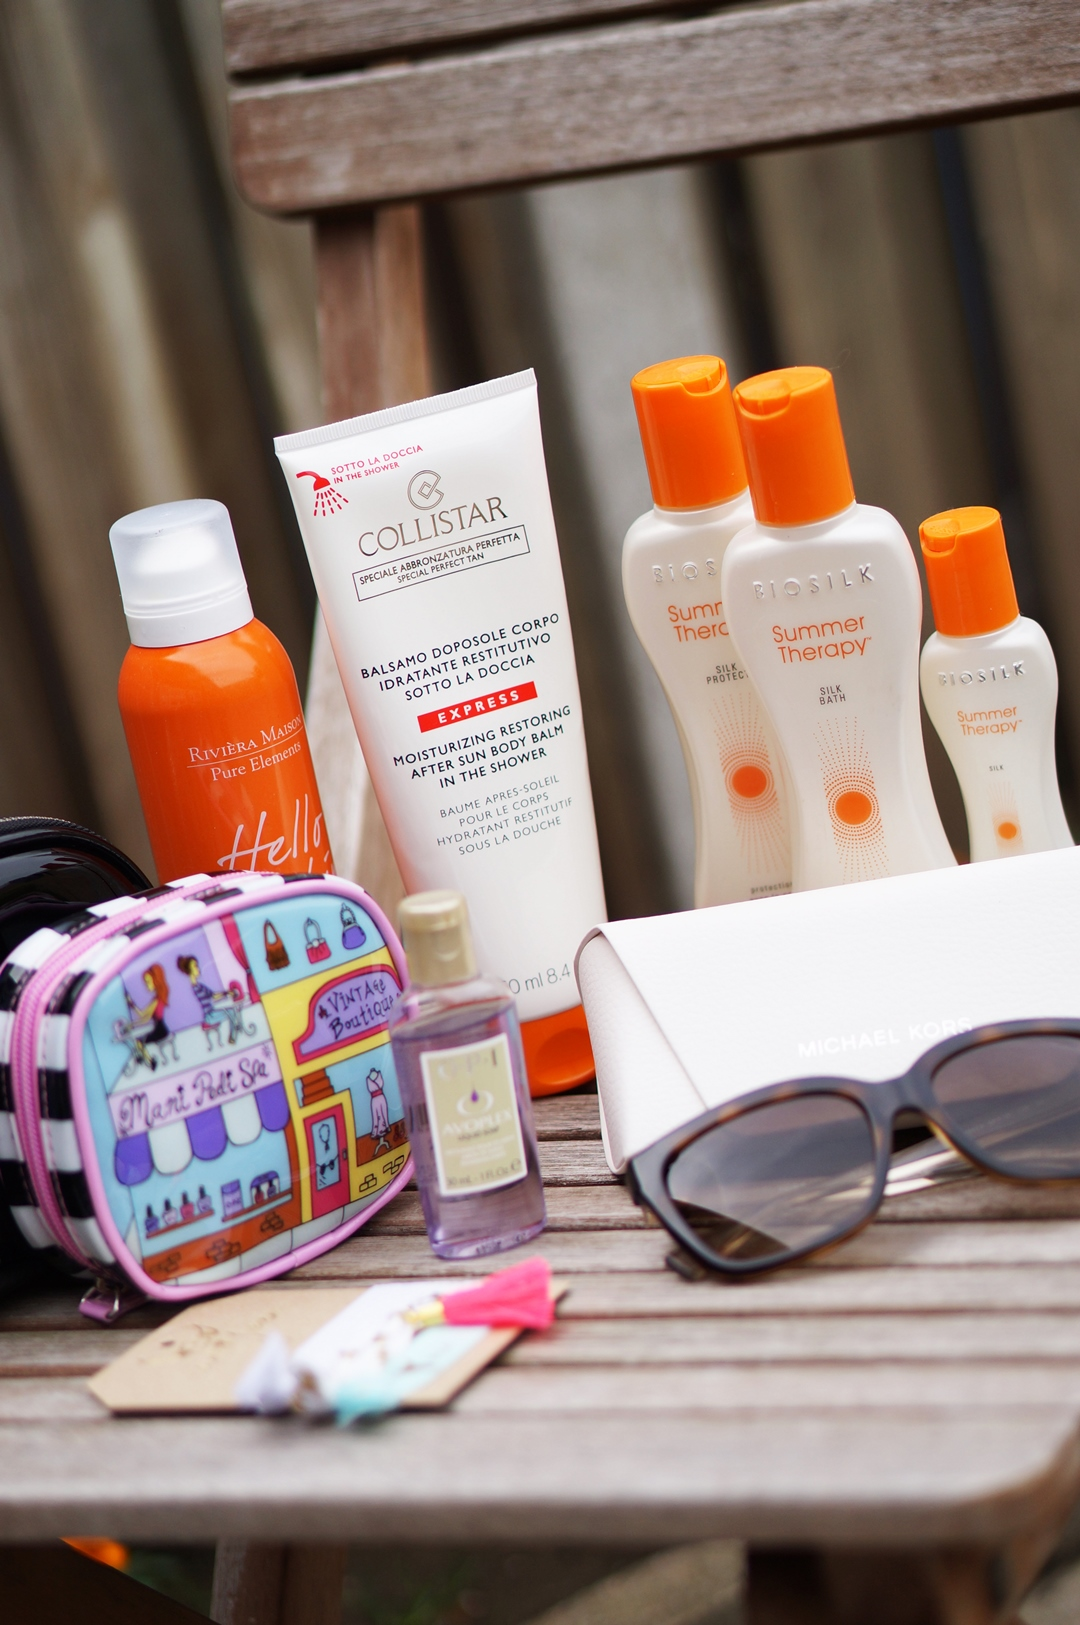 summer-musthaves-sunglassesshop-opi-rivere-maison-marc-inbane-biosilk (5)